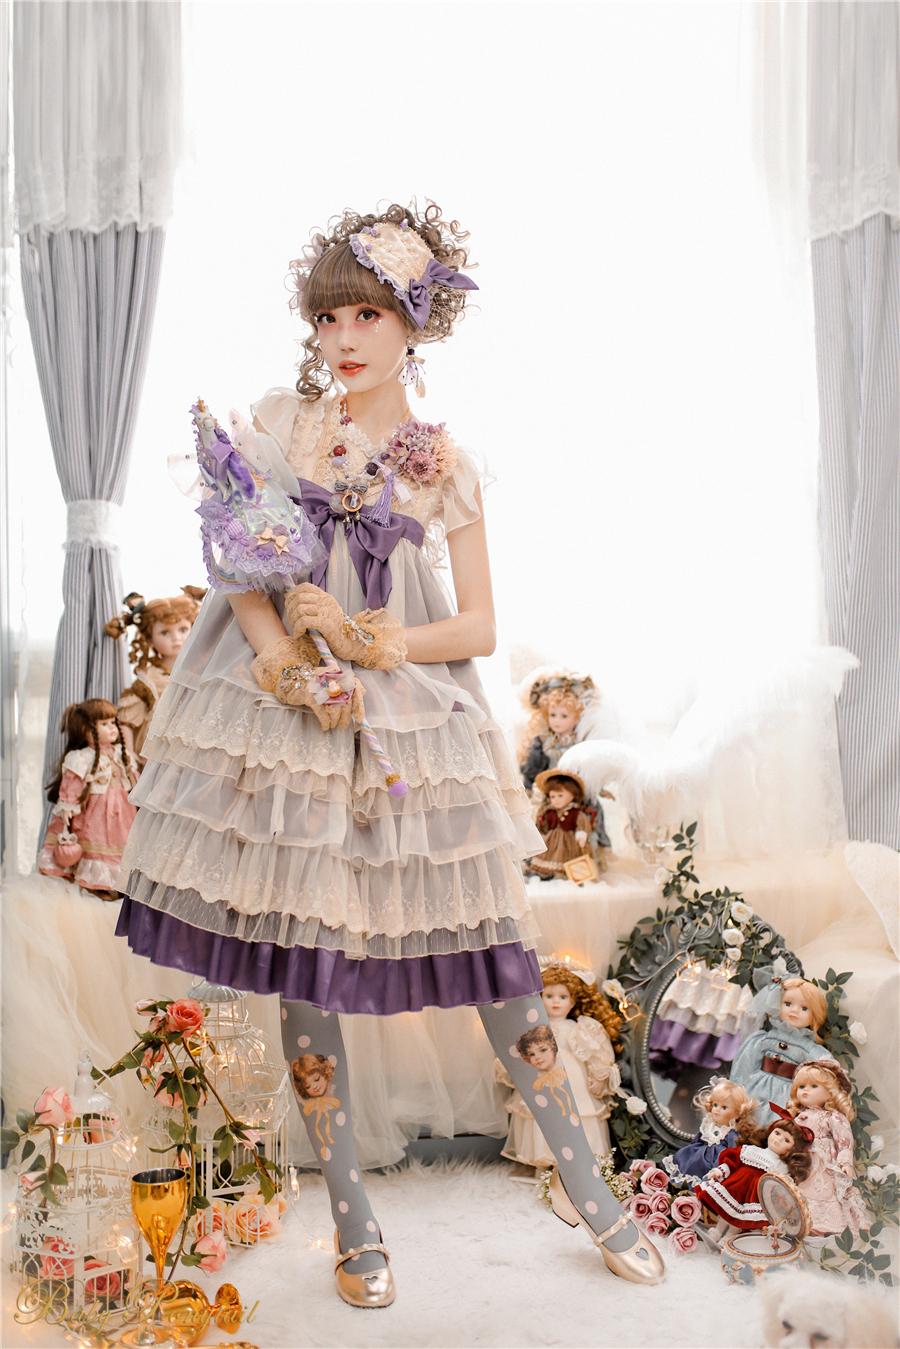 Babyponytail_Model Photo_Present Angel_JSK Violet_2_Kaka_05.jpg